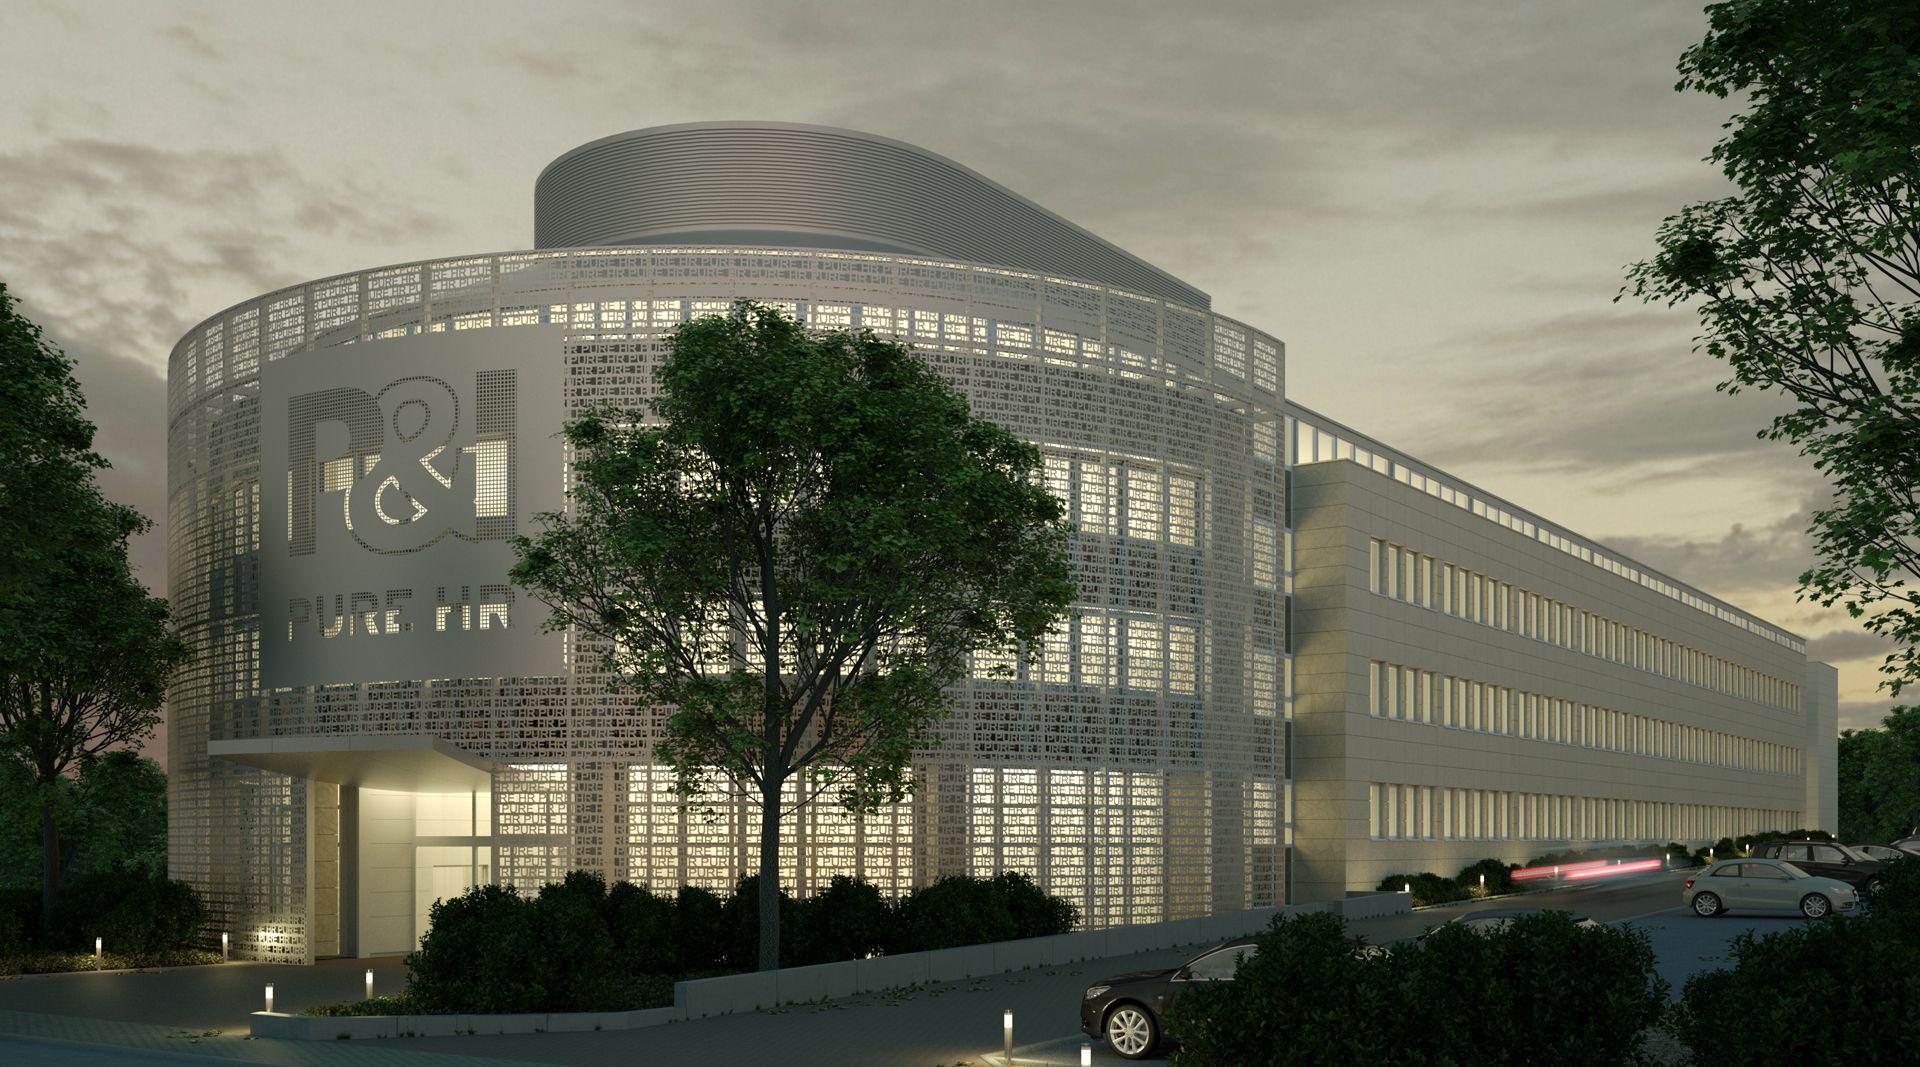 Visualisierung Fassade - Metallfassade Nachtbild